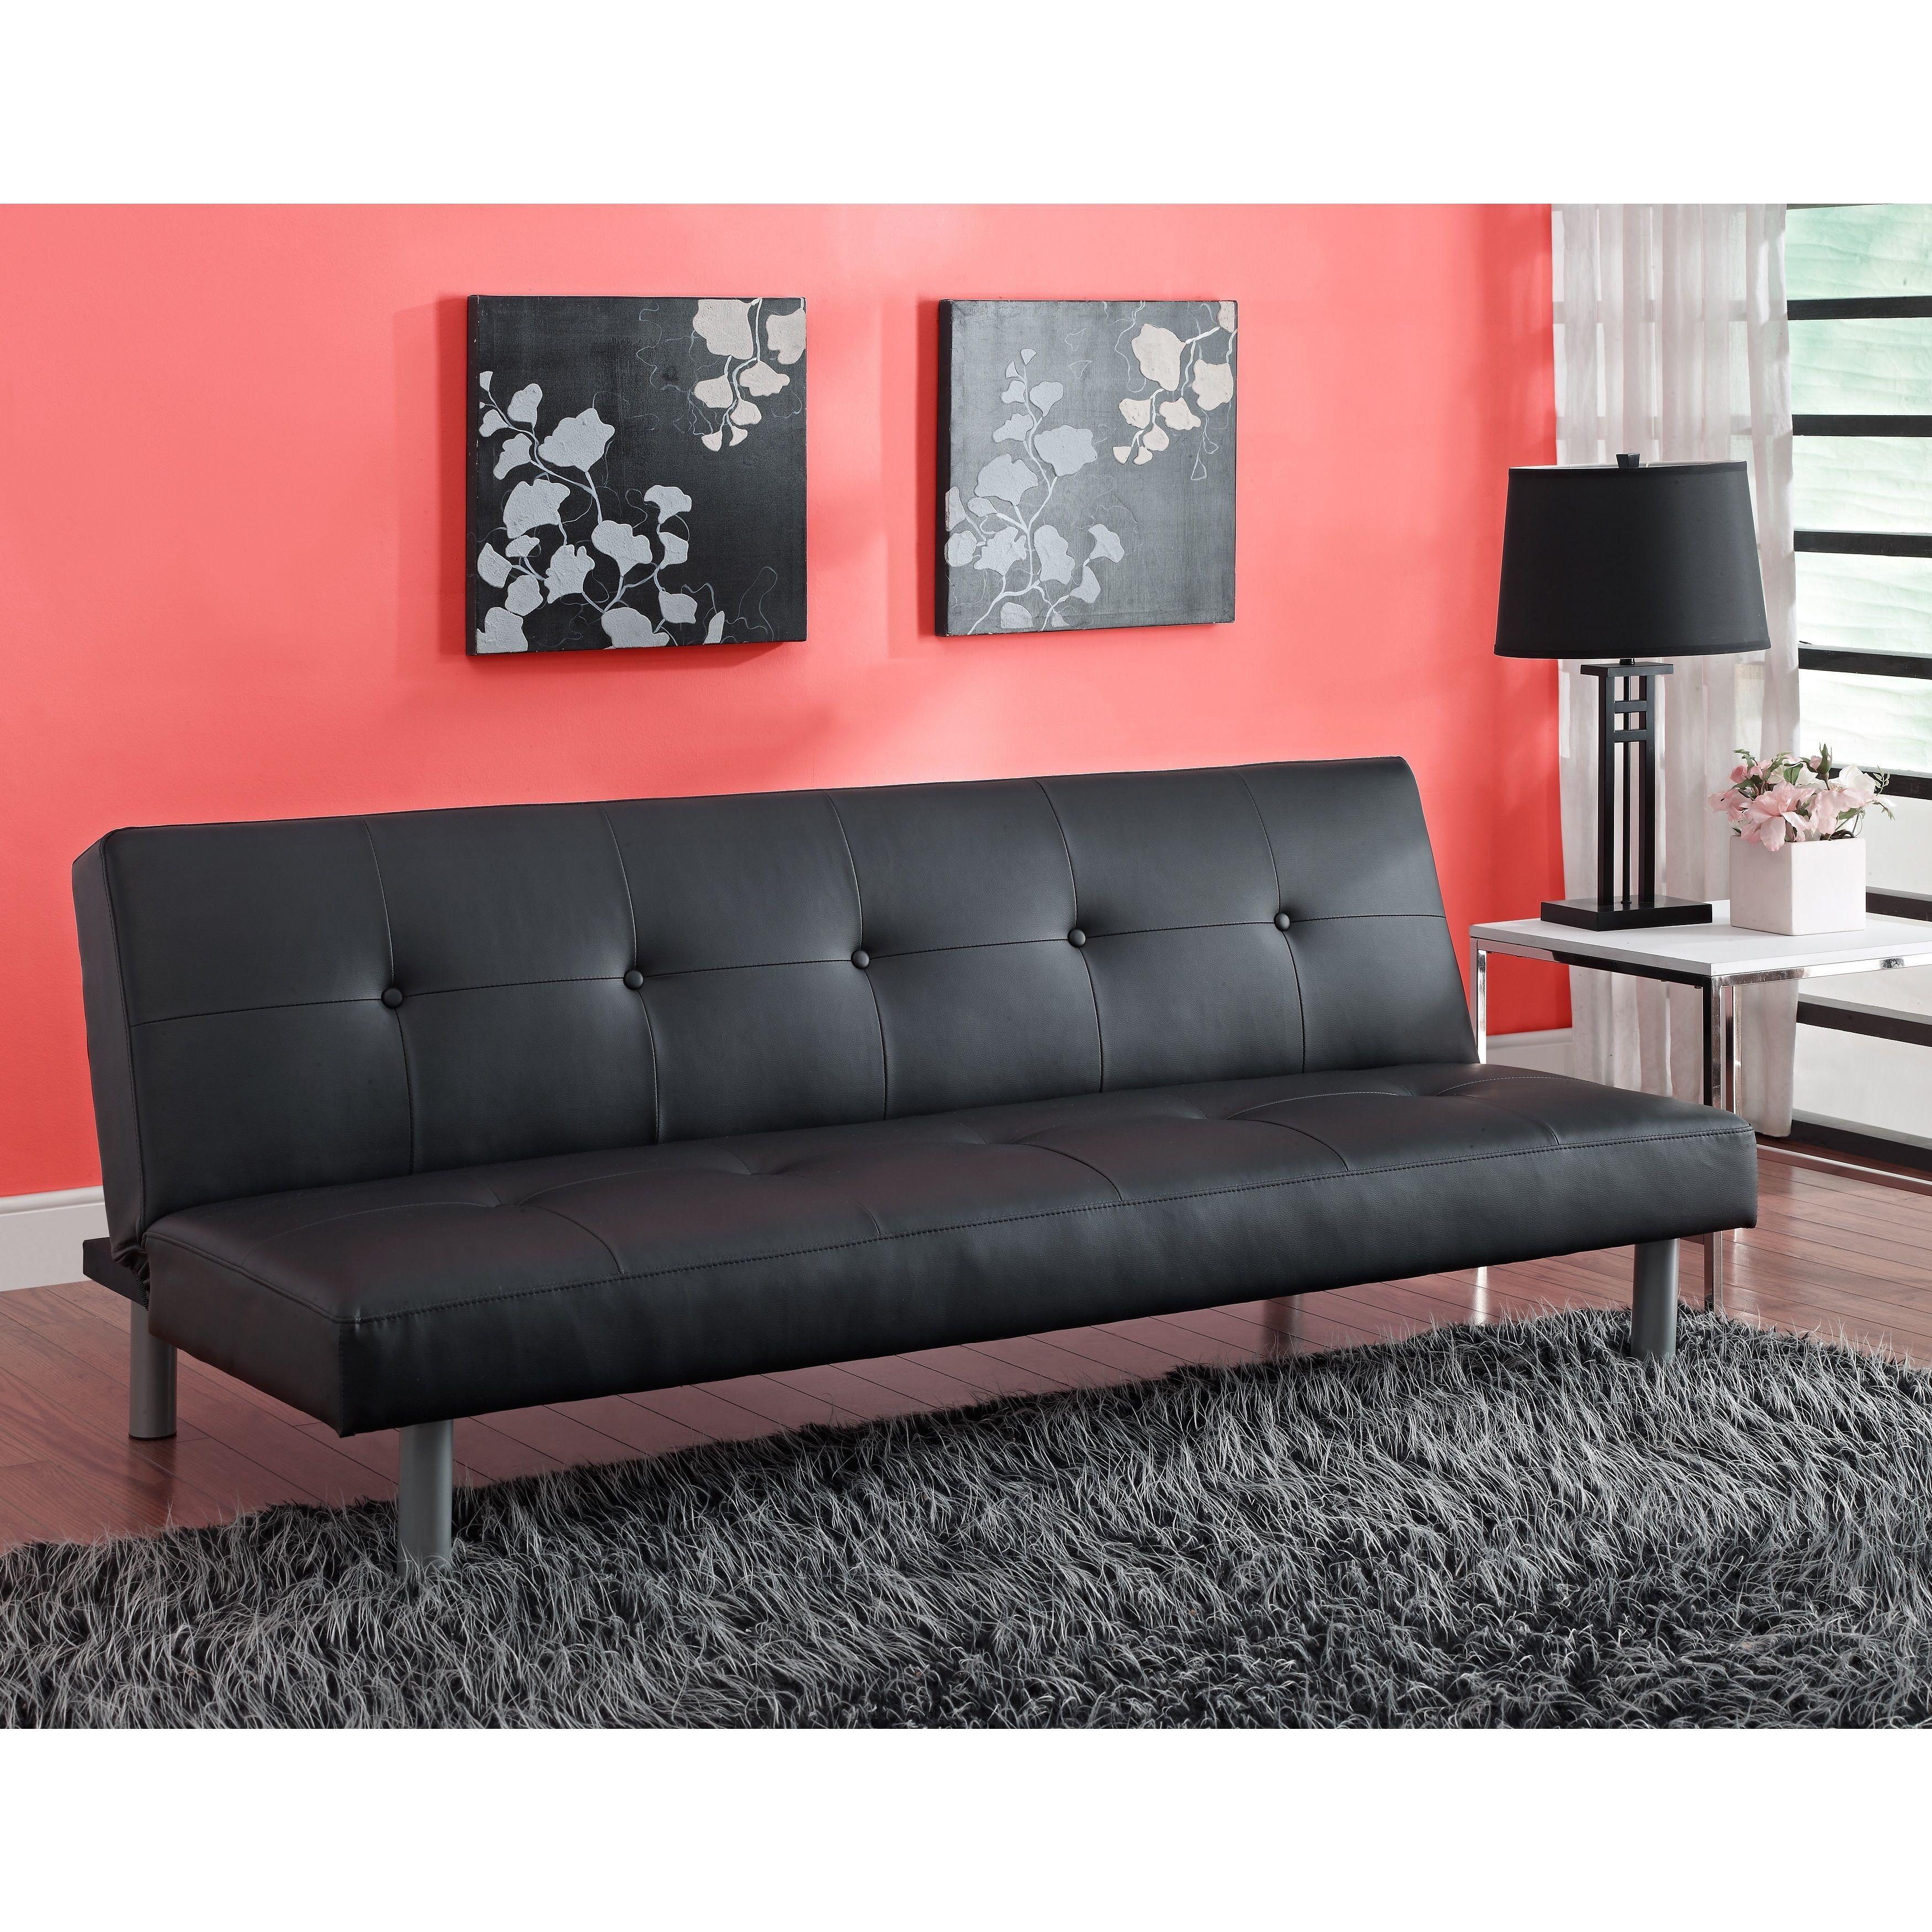 DHP Nola Futon Sofa Bed DHP Black